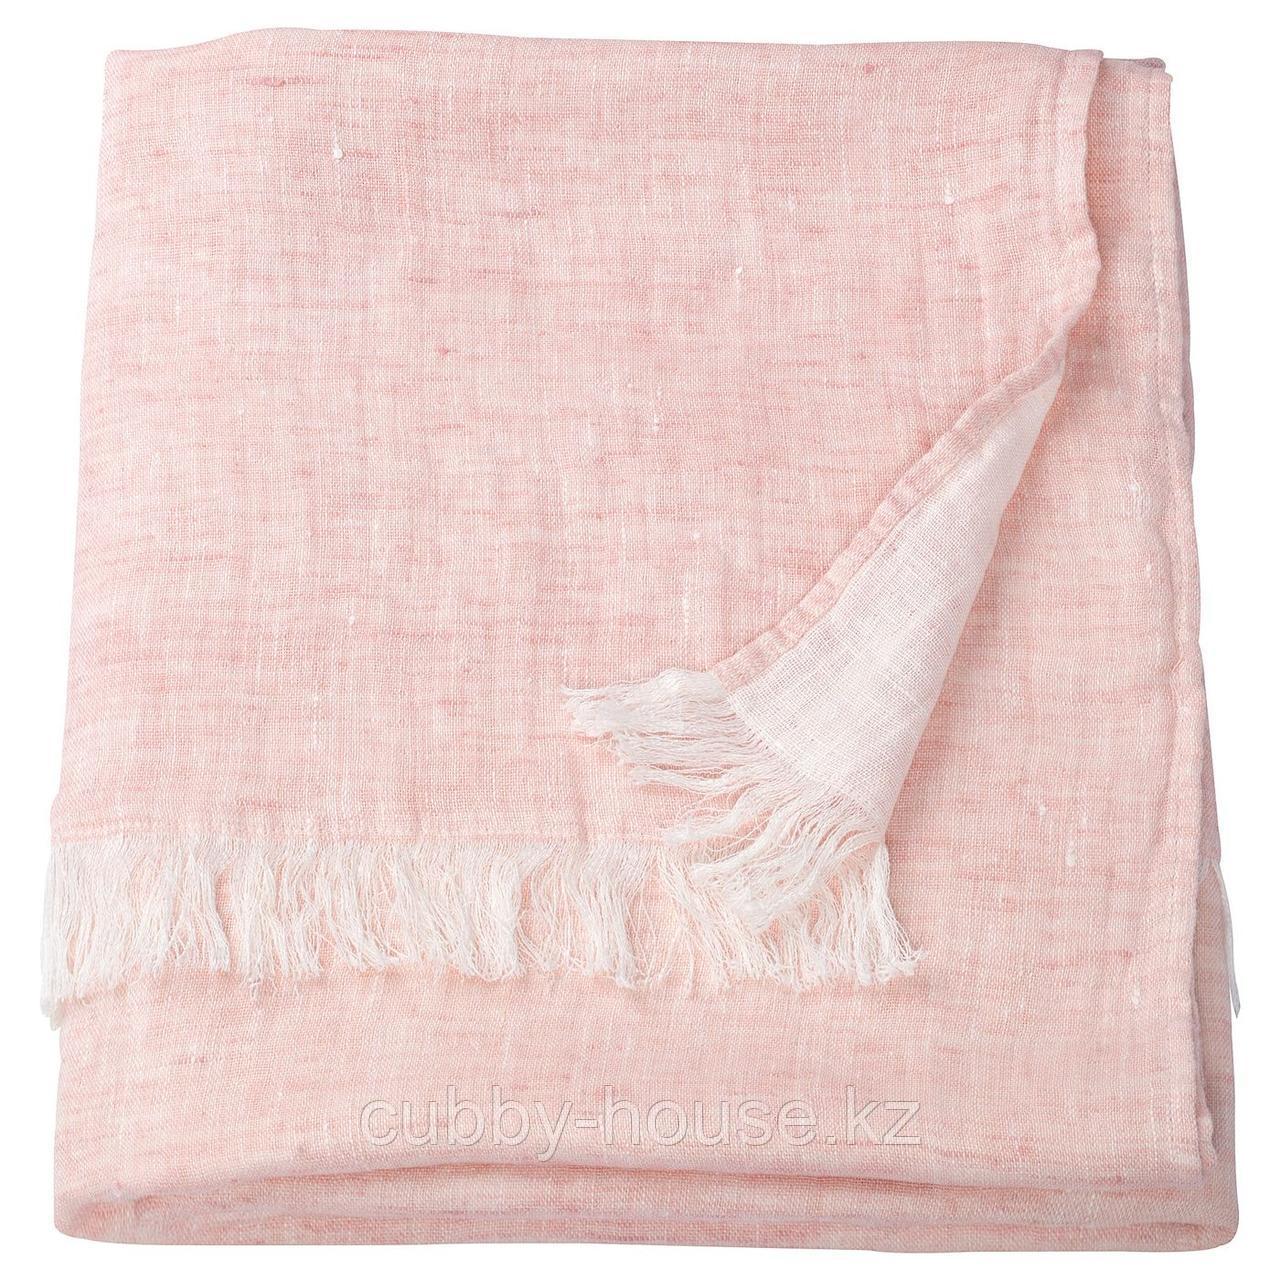 ГУЛЬТАЛЛ Плед, розовый, 130x170 см